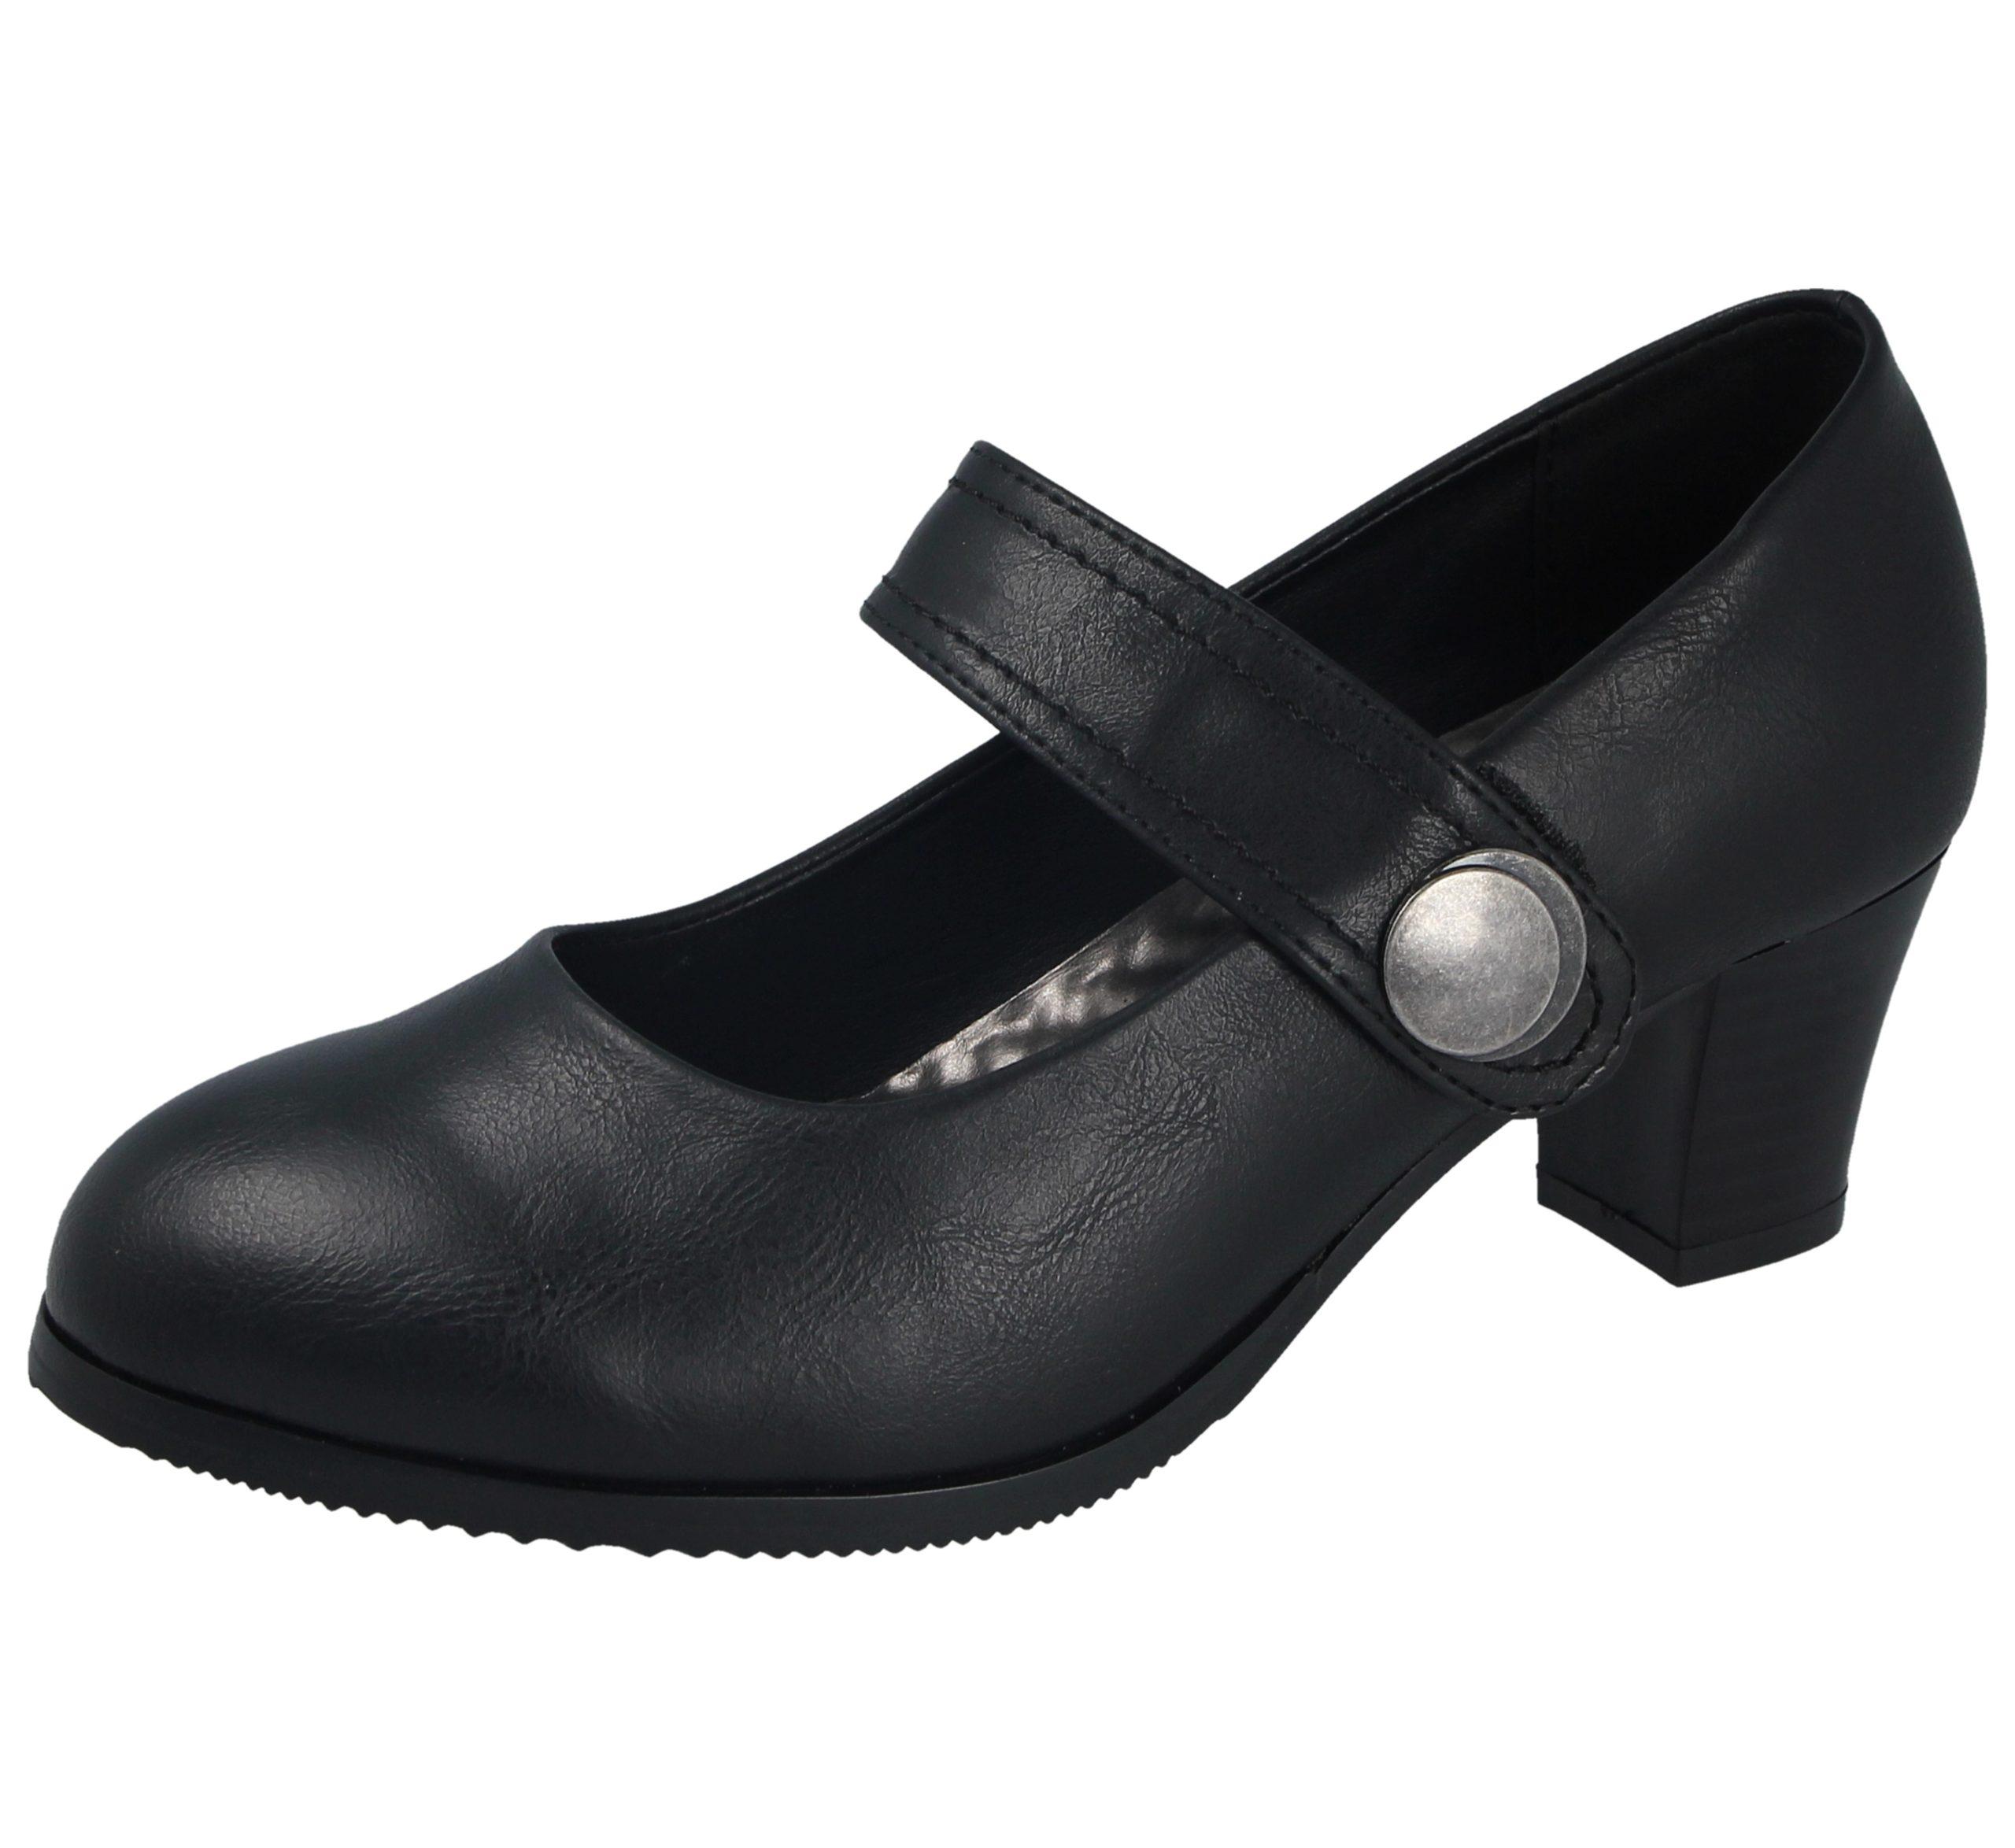 Womens Wedge Ankle Boot in Burgundy by Cushion Walk